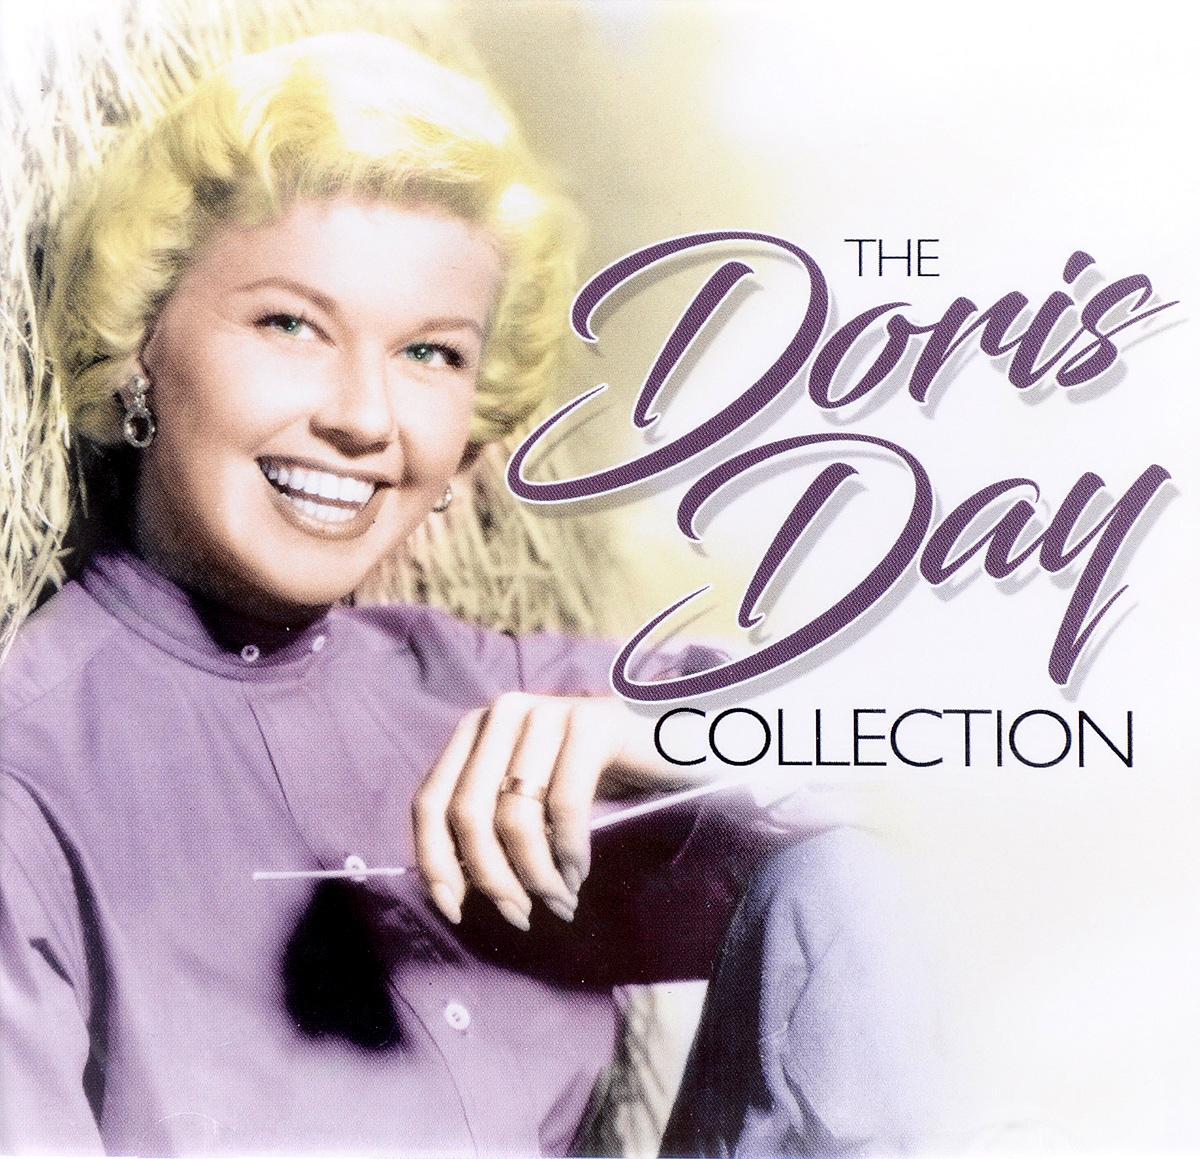 Дорис Дэй Doris Day. The Doris Day Collection (2 CD) doris lessing the good terrorist